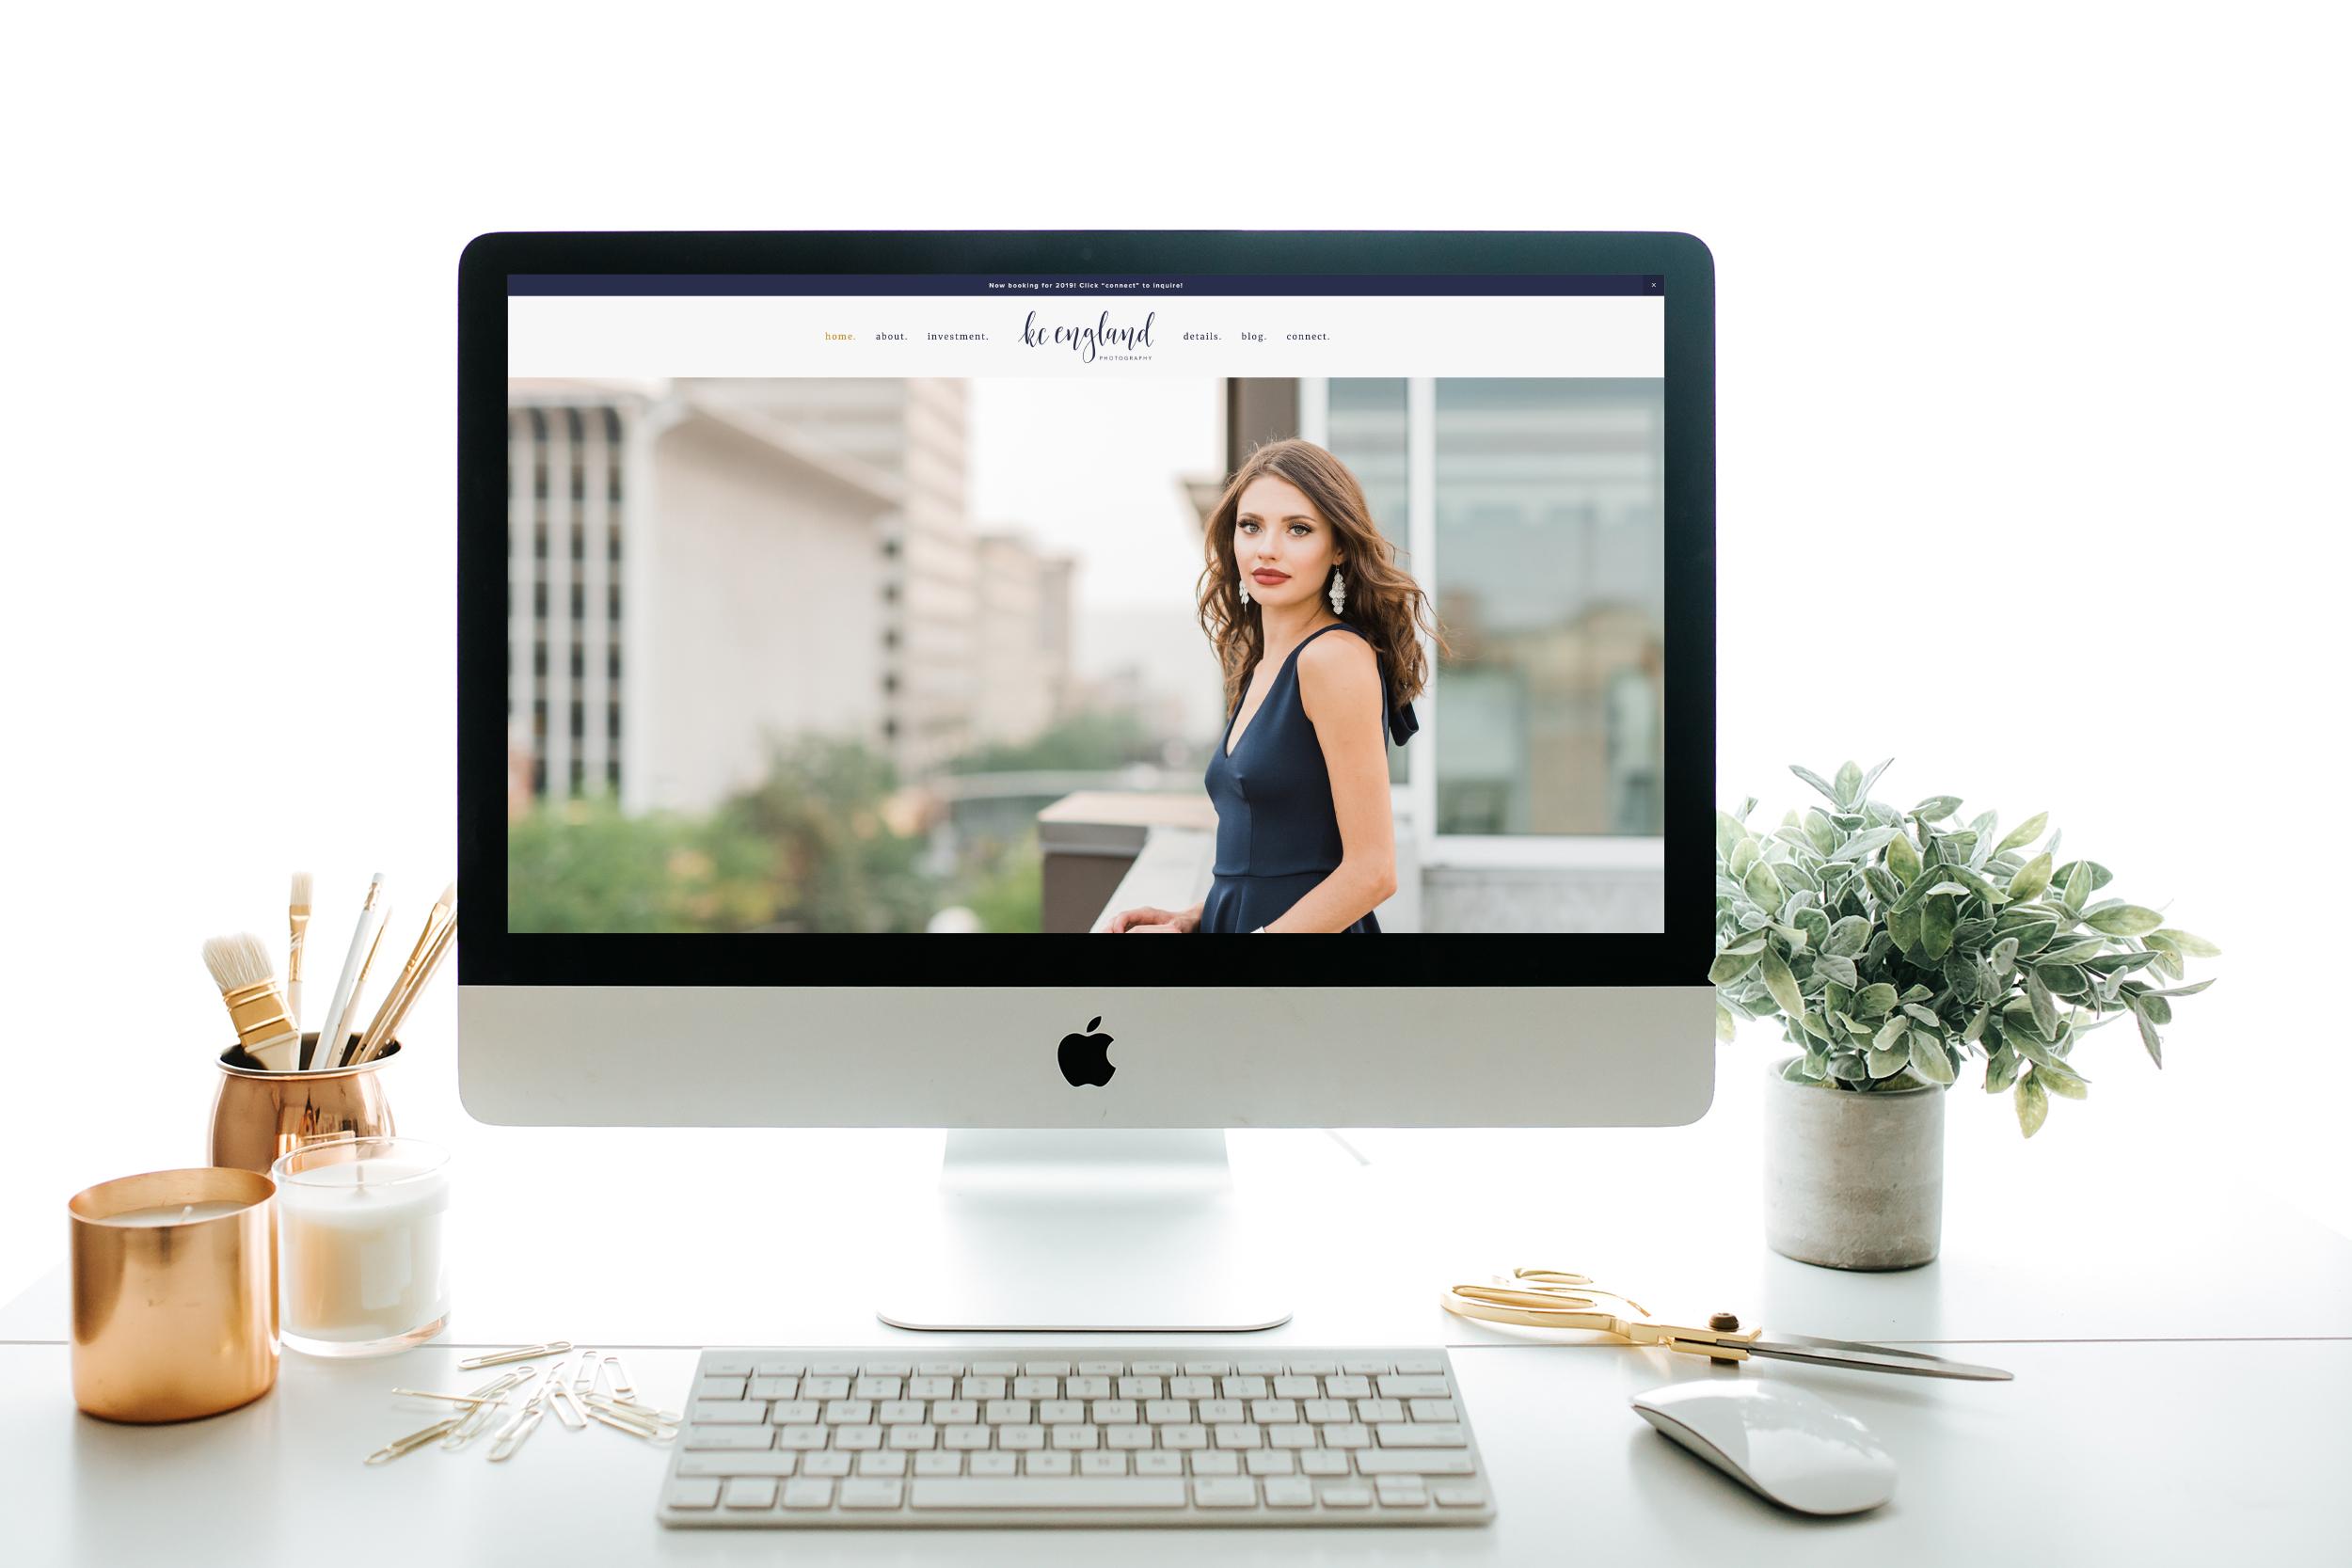 KC_England_Photography_website_refresh